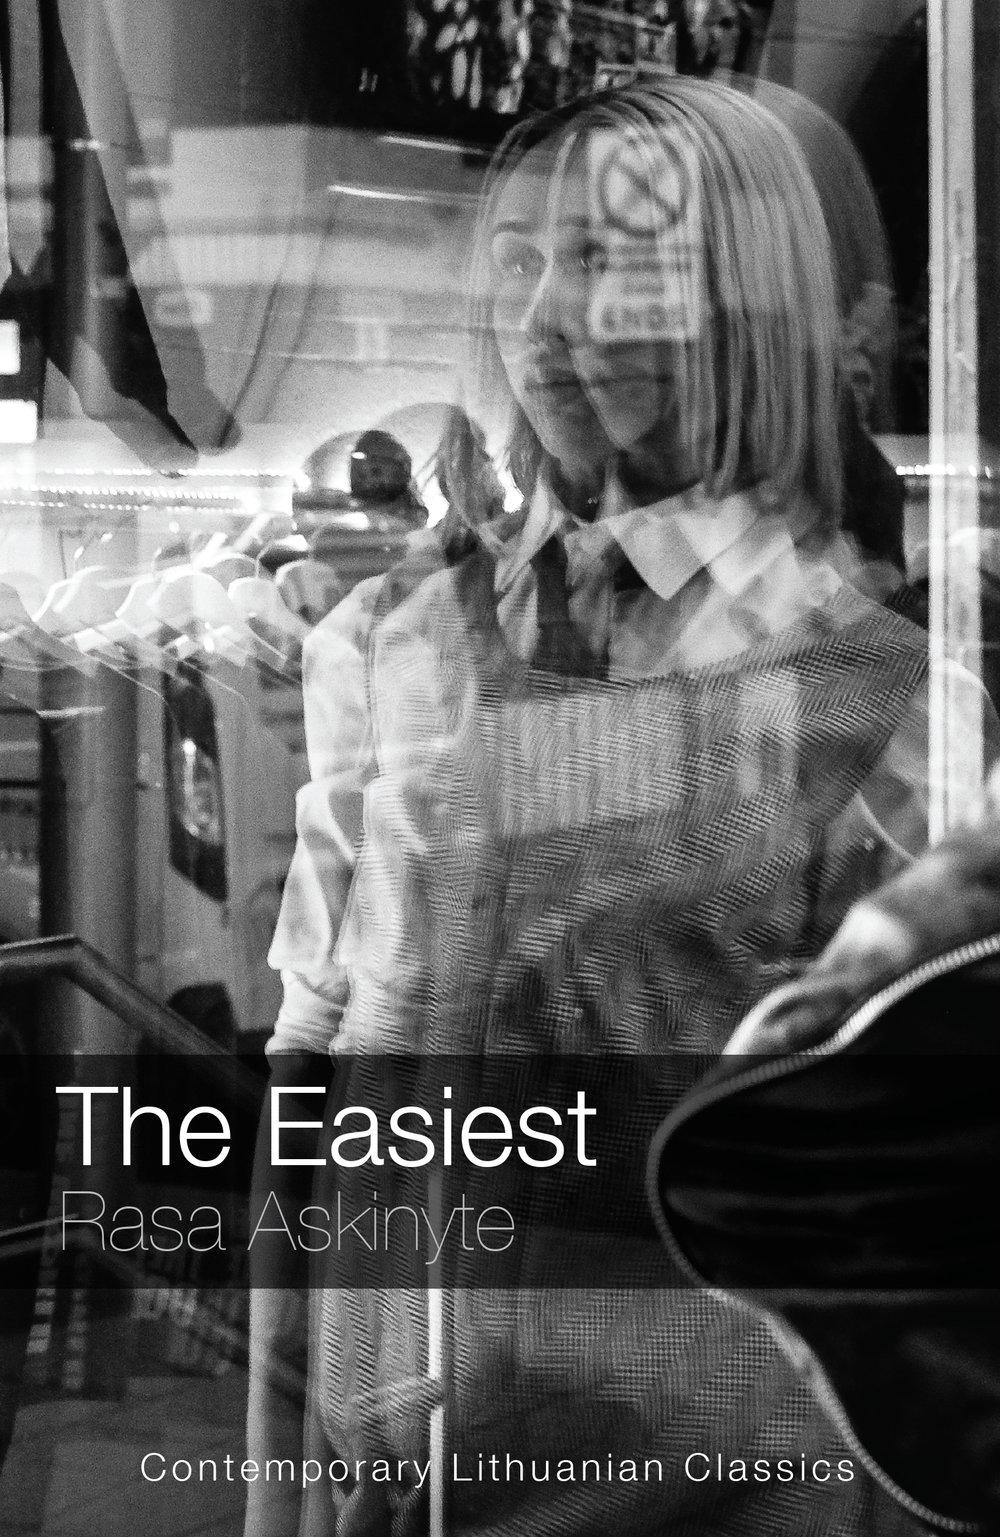 The Easiest - Rasa Askinyte